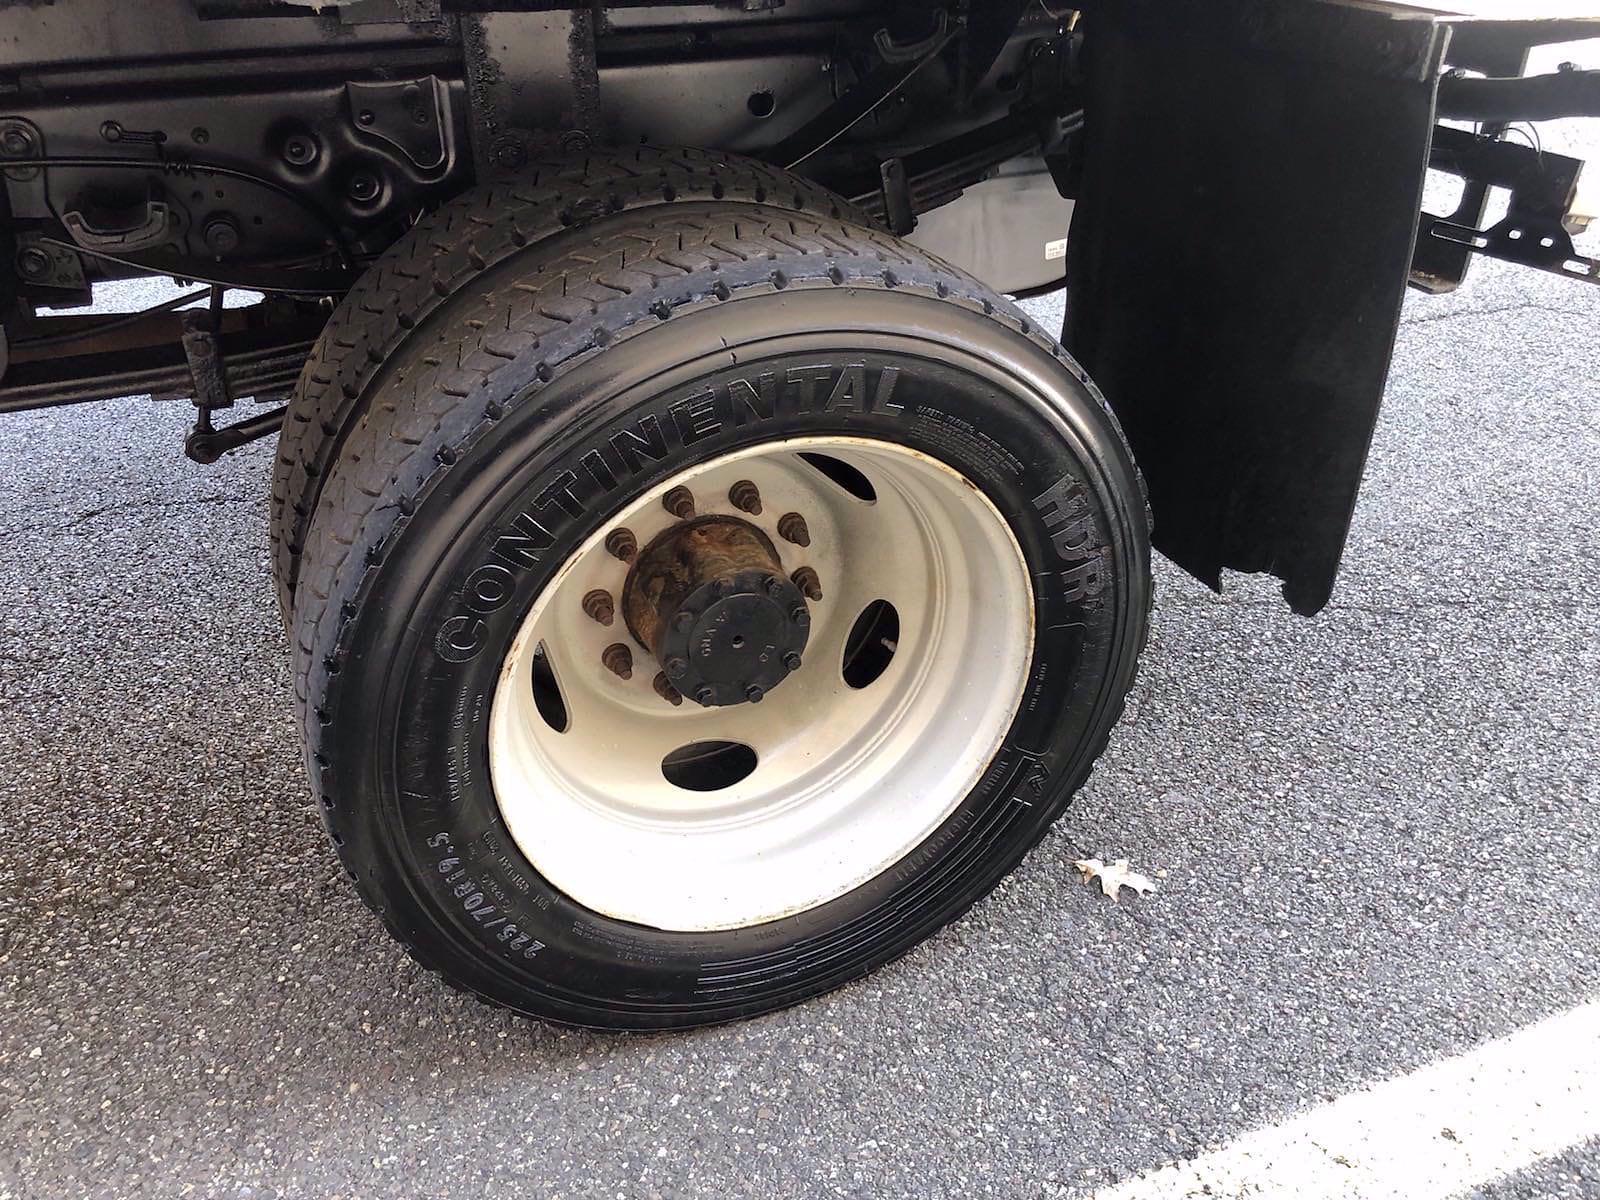 2016 Ford F-550 Regular Cab DRW 4x4, Dump Body #FL1098J - photo 19